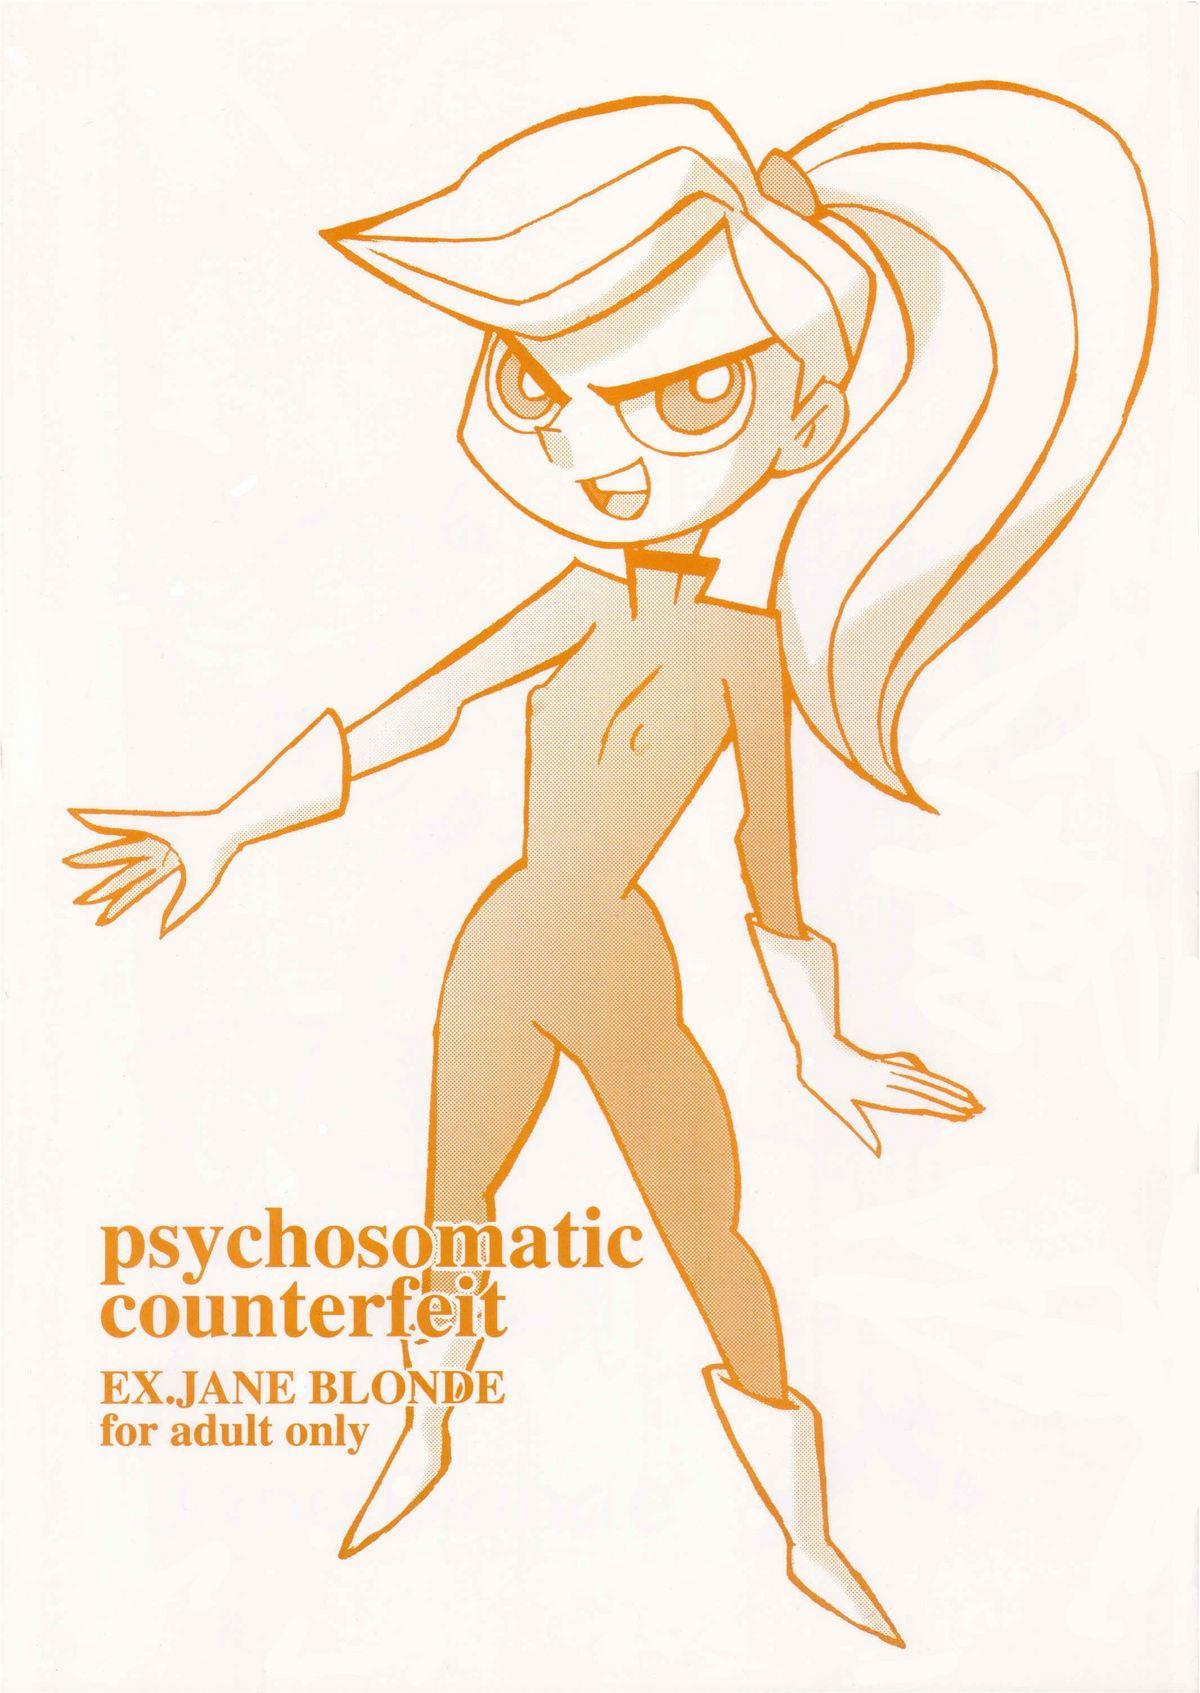 SureFap xxx porno Jane Blonde - [Union of the Snake (Shinda Mane)] - Psychosomatic Counterfeit Ex Jane Blonde